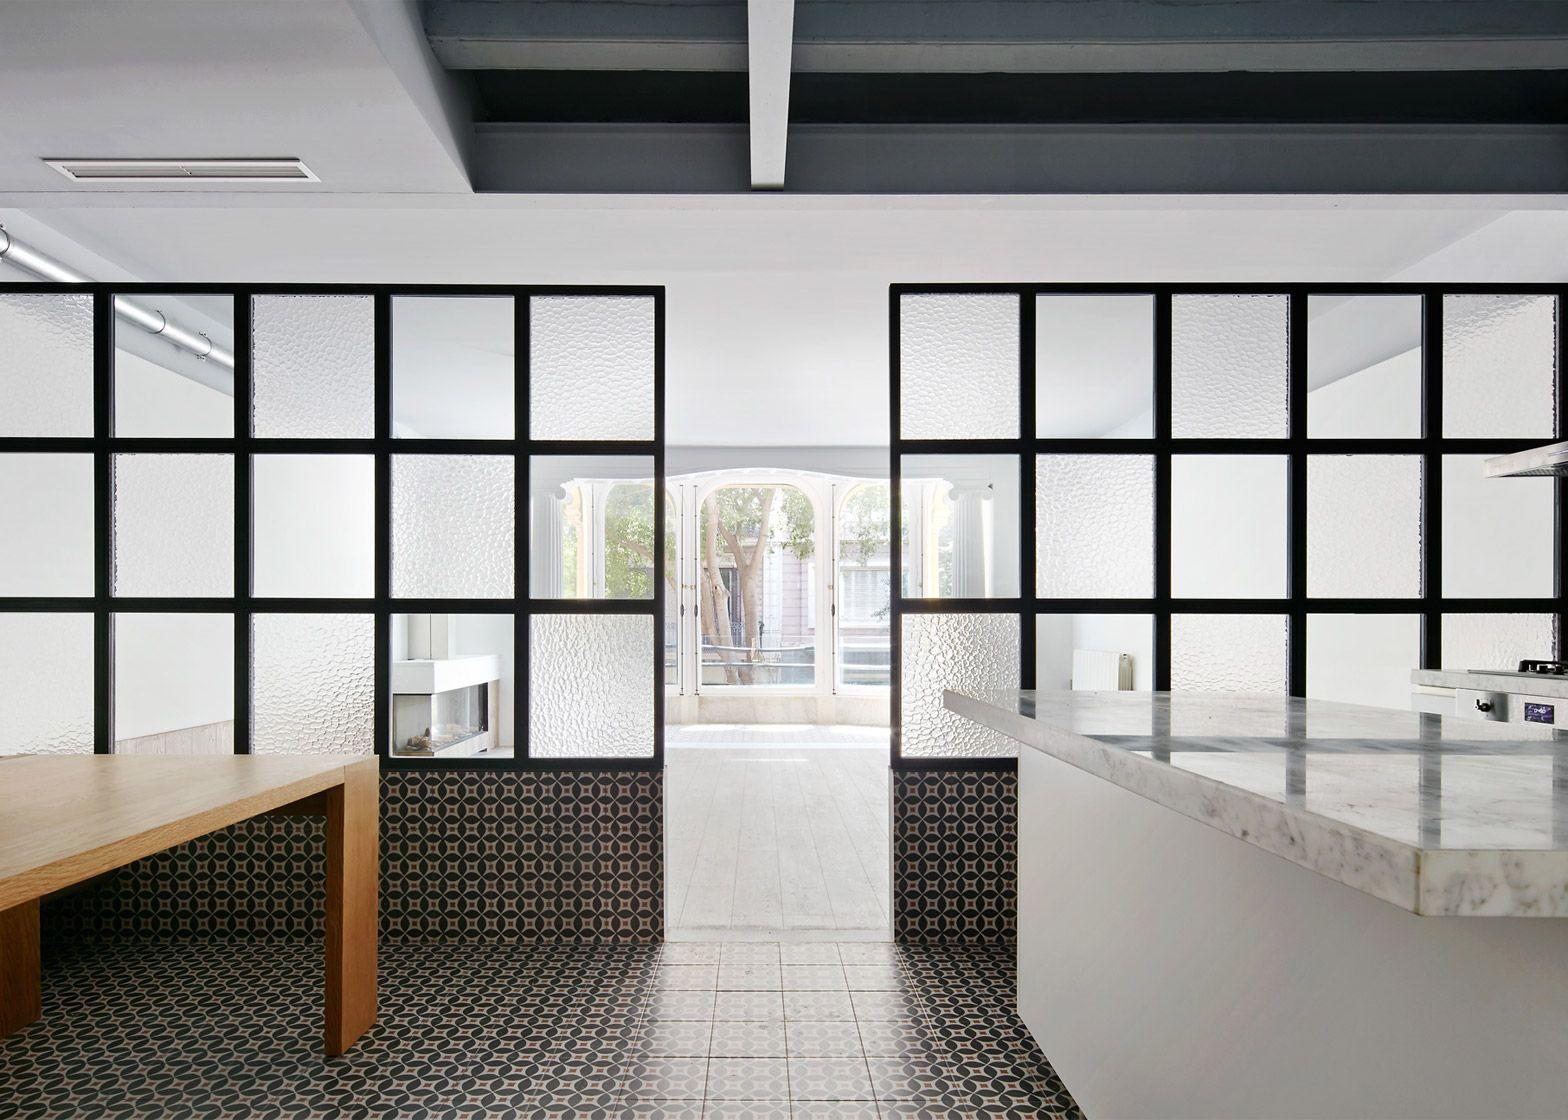 Raúl Sánchez overhauls Barcelona apartment